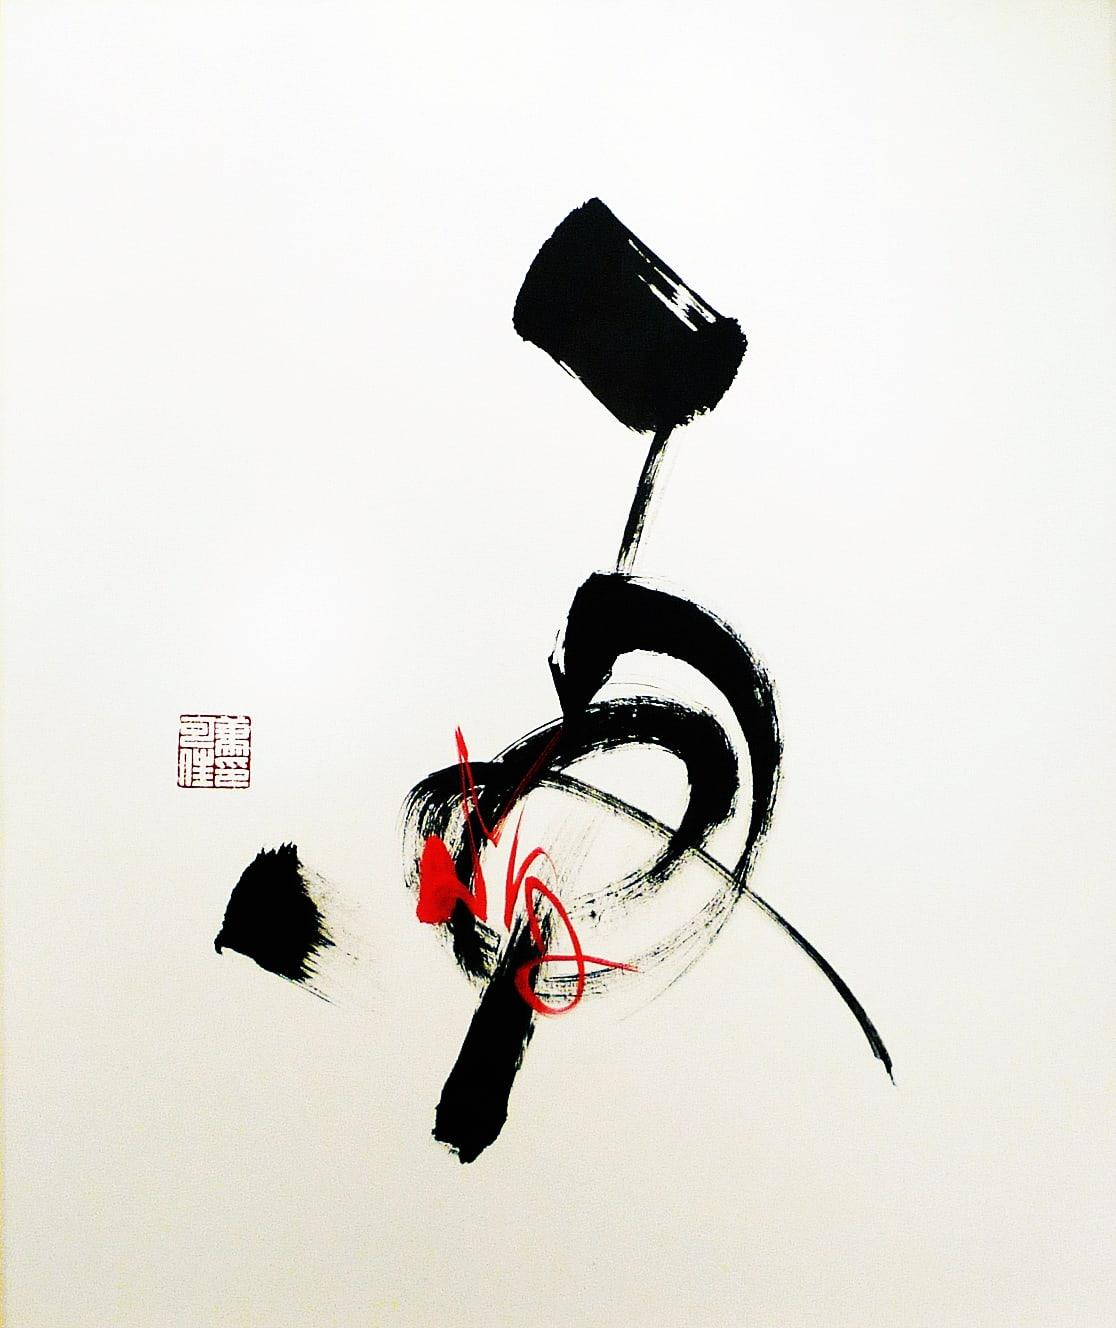 Katherine Xiao 蕭可佳, With Joy 笑迎迎, 2012